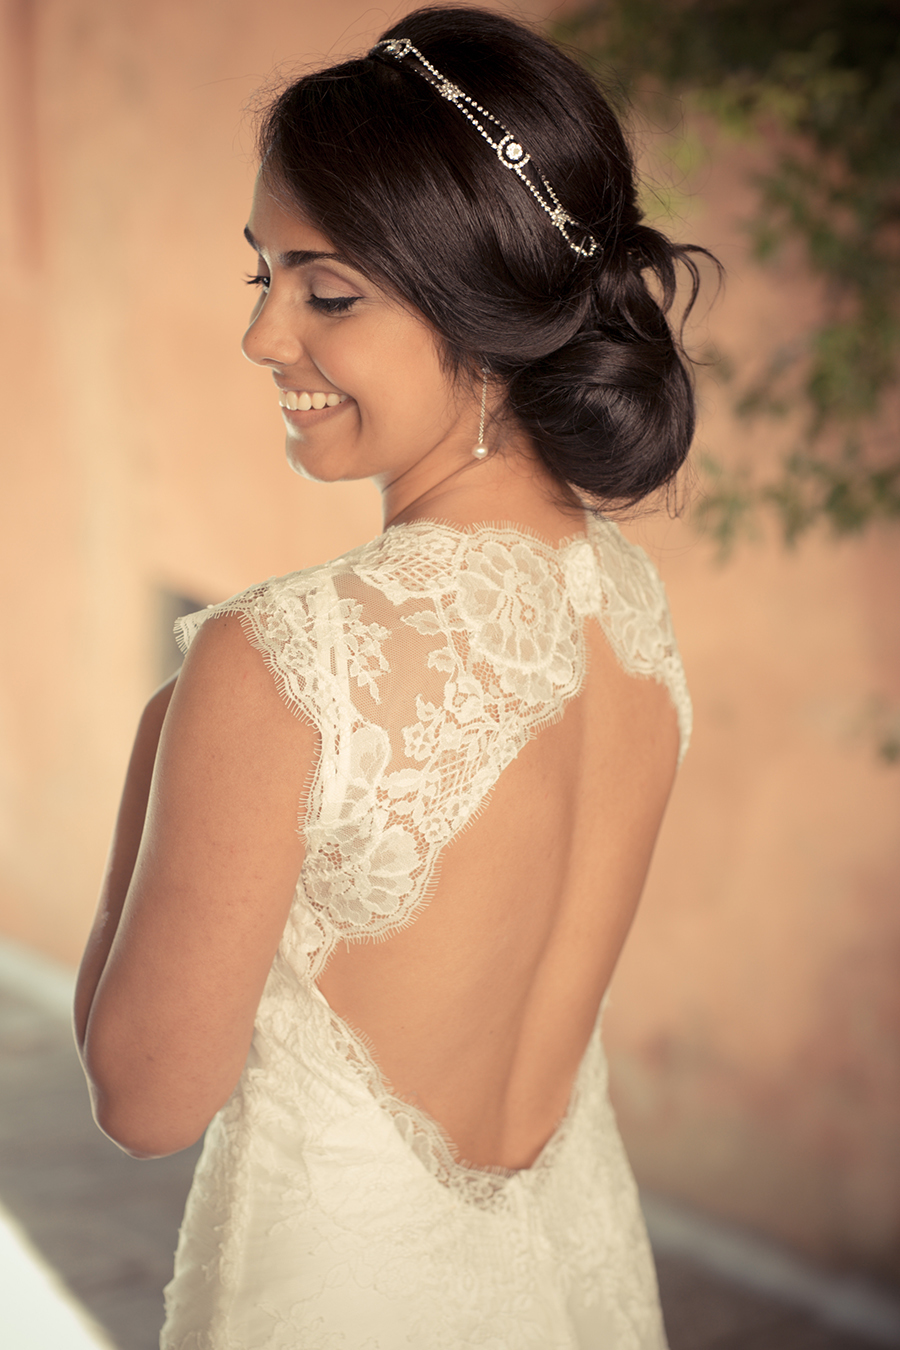 02 :: Romantic Jewish Wedding :: Photo - 2 :: 02